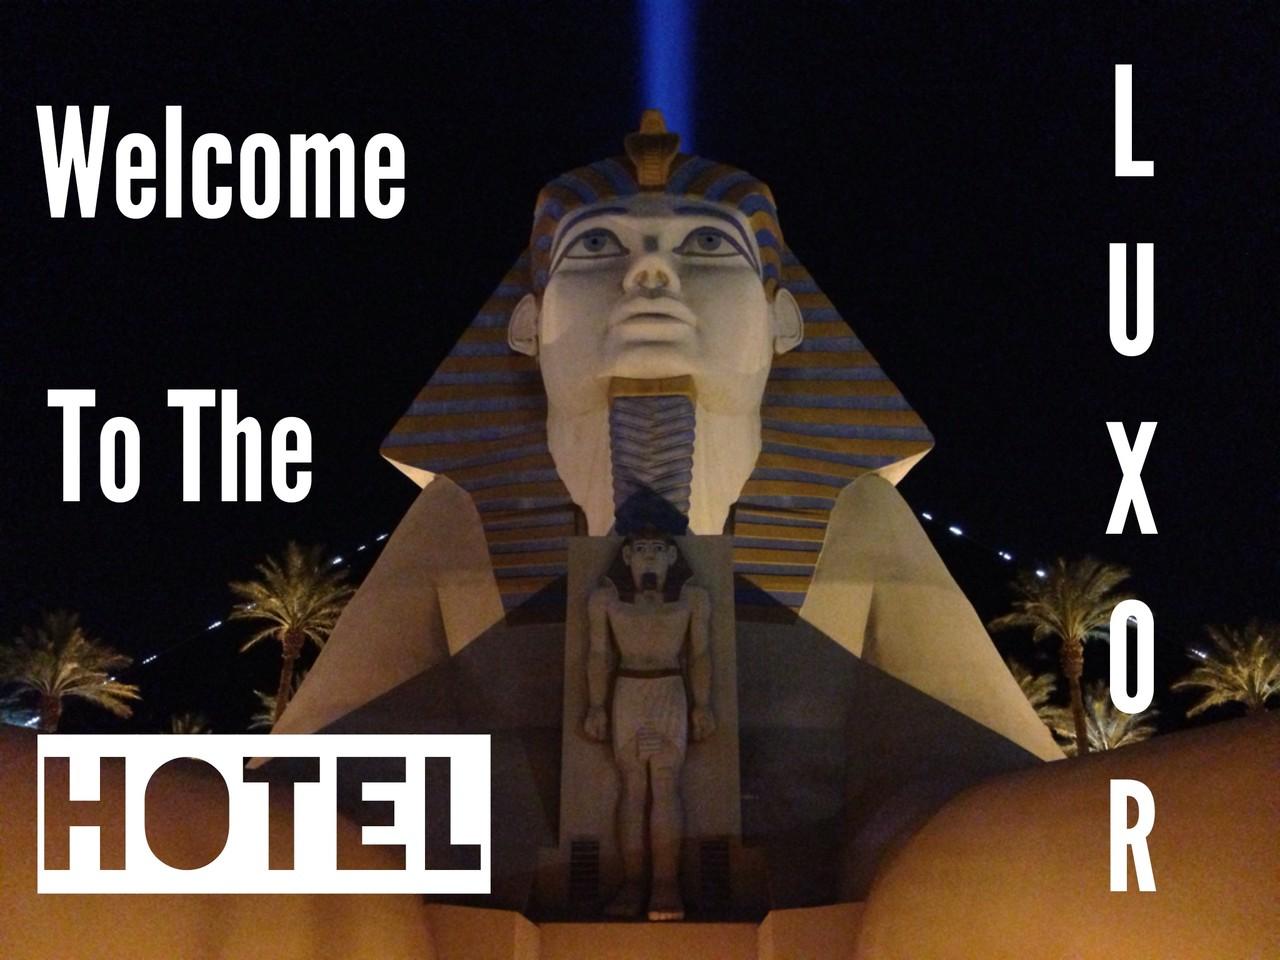 Luxor again